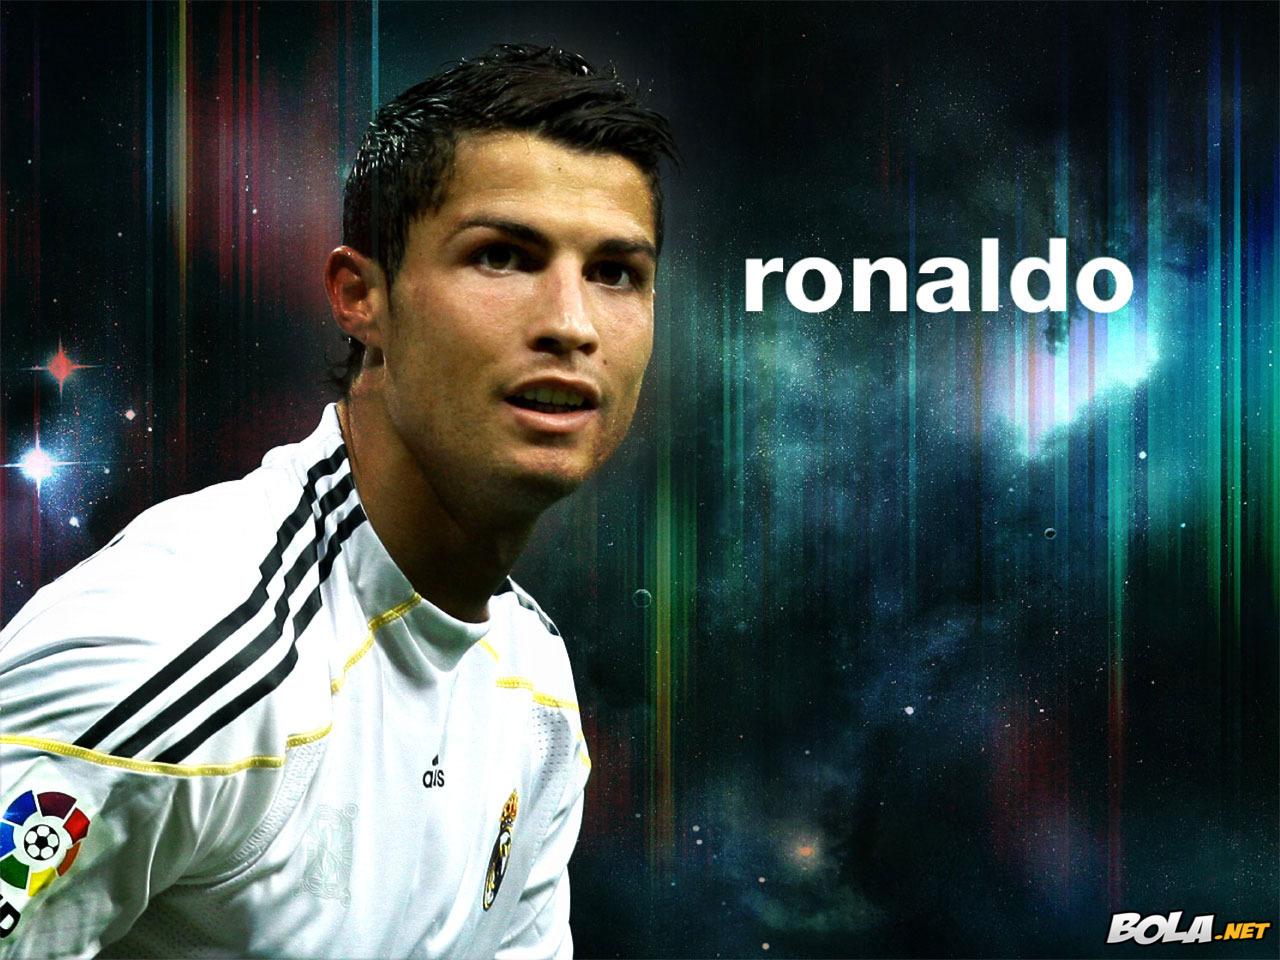 http://2.bp.blogspot.com/-UlPLXmgmHZs/UBBd4KoliCI/AAAAAAAAJX8/CWuYGFZ9Cbs/s1600/Wallpapers+de+Cristiano+Ronaldo,+images+%288%29.jpg